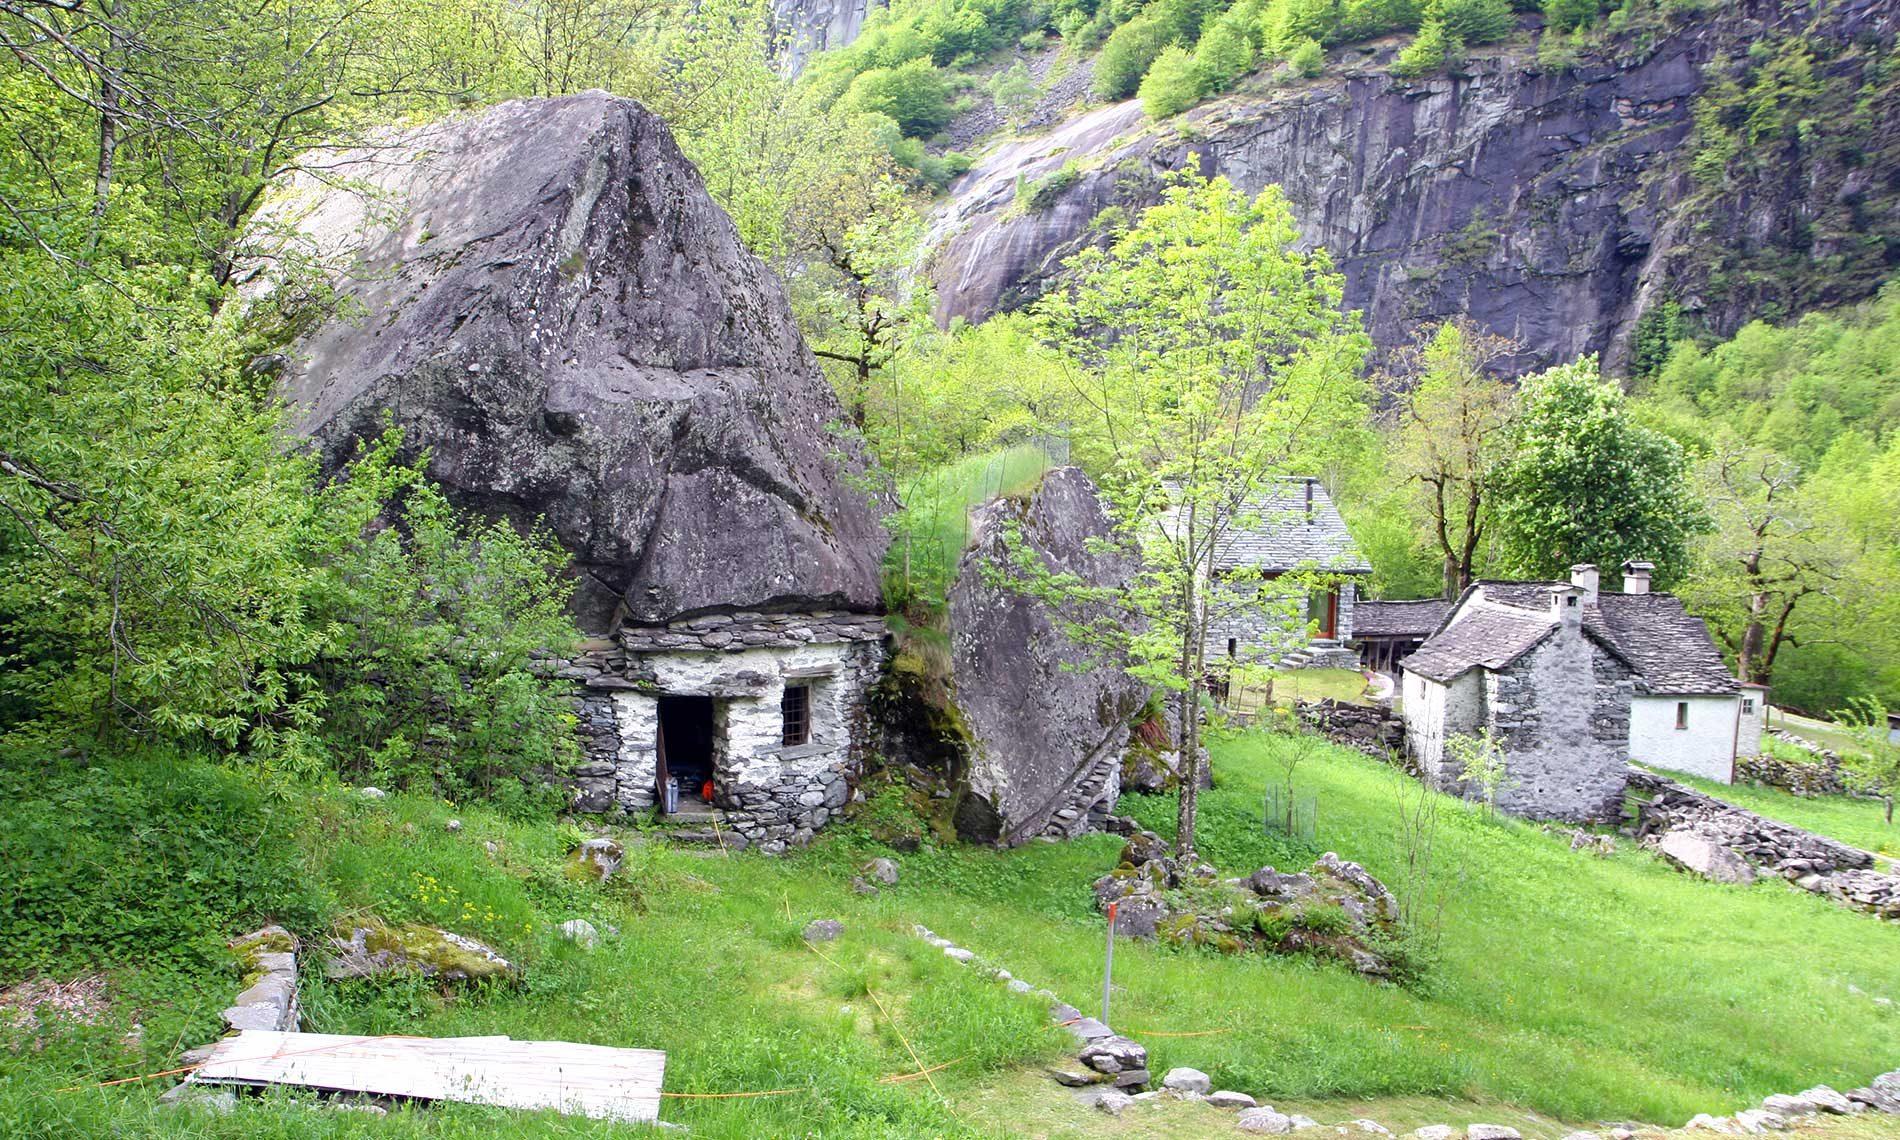 Campo Nomade Primaverile - Sabbione, Val Bavona (CH)